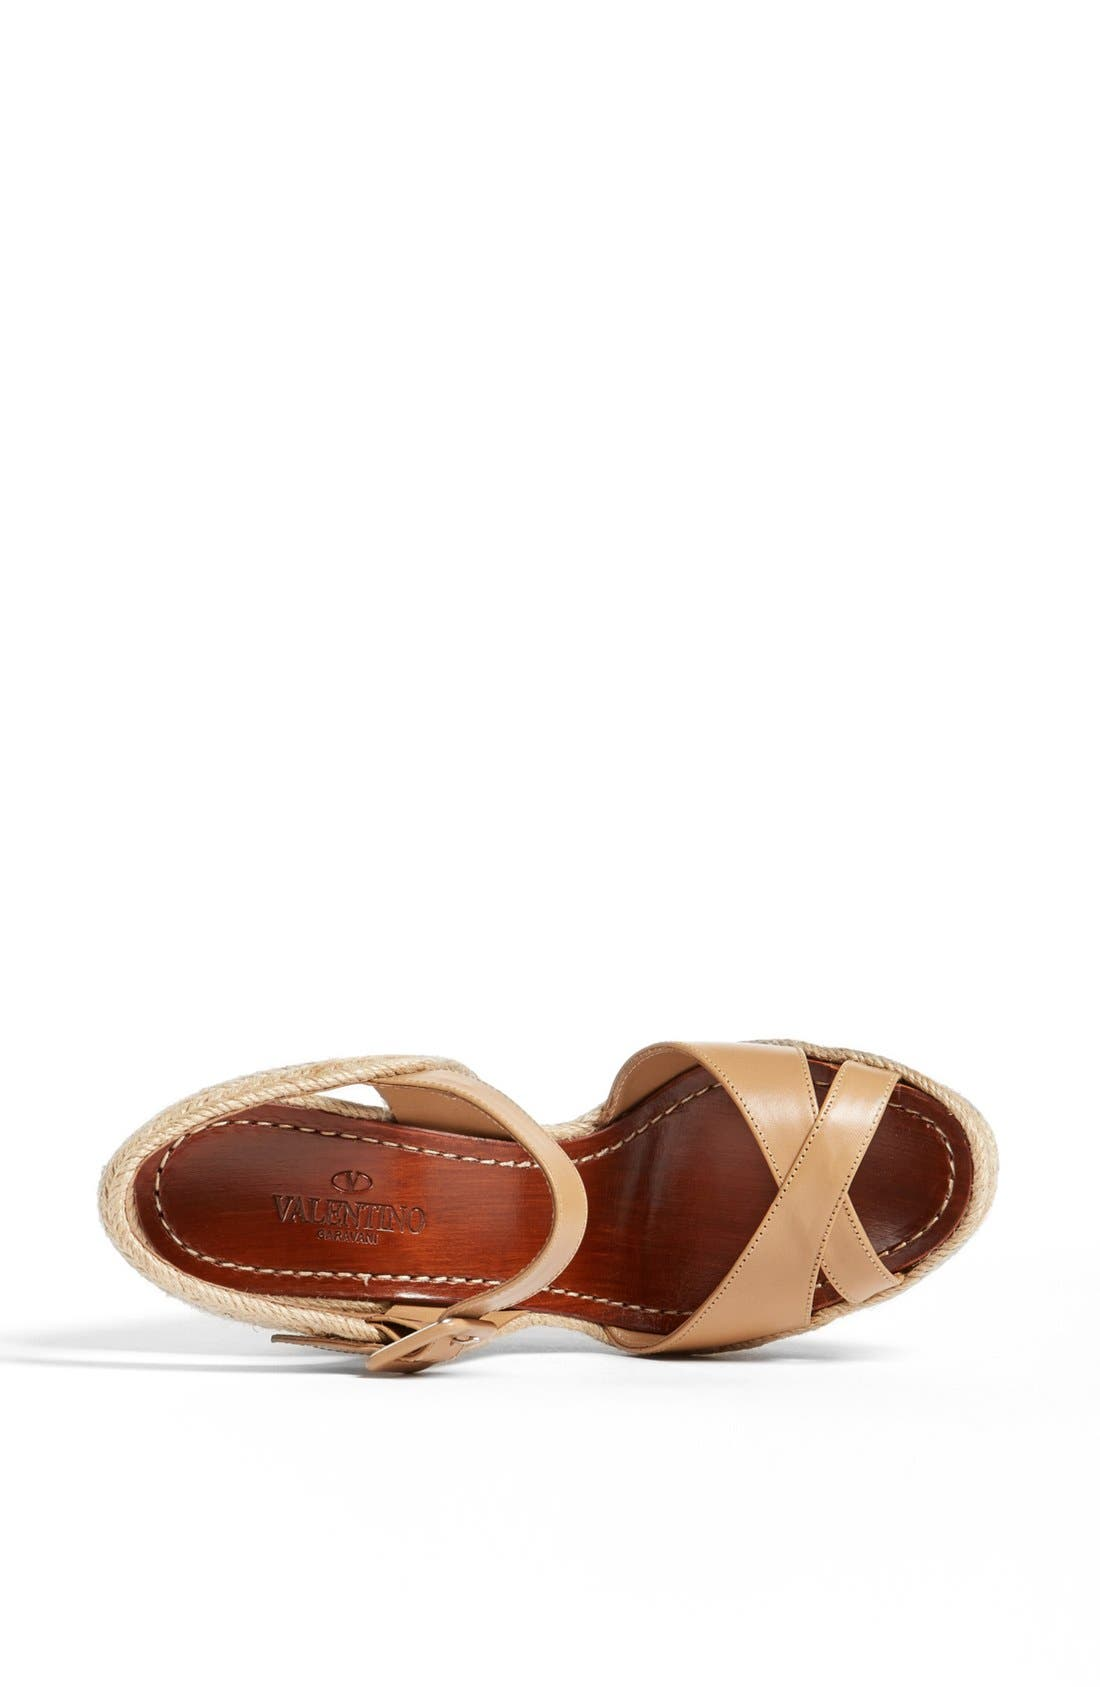 Alternate Image 3  - Valentino 'St. Tropez' Espadrille Wedge Sandal